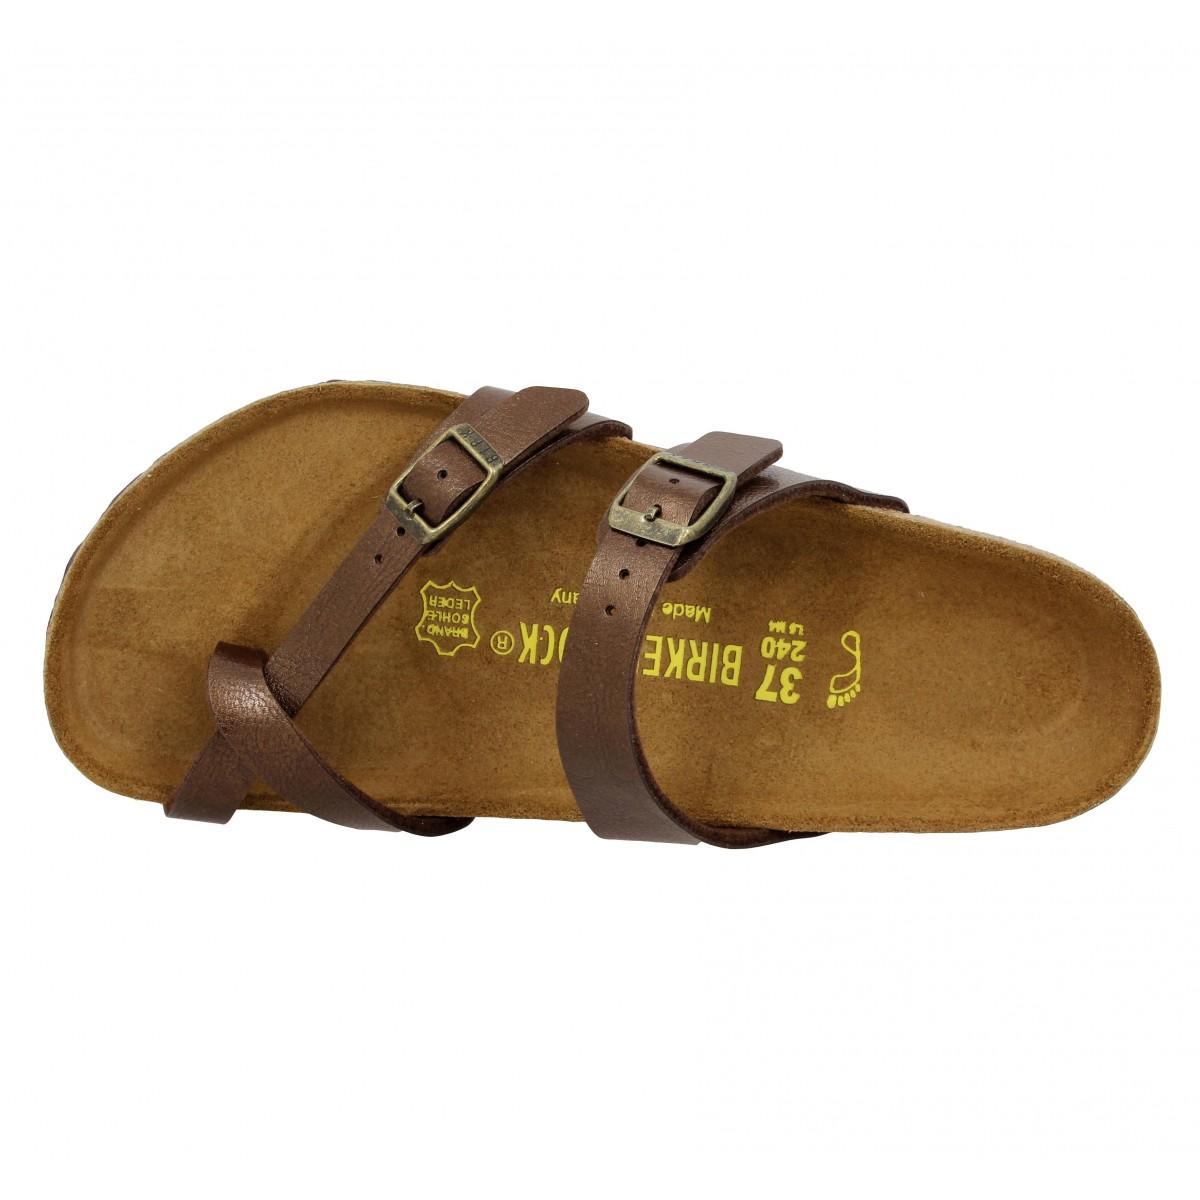 Chaussures Birkenstock Mayari marron femme oReOo8kPeZ